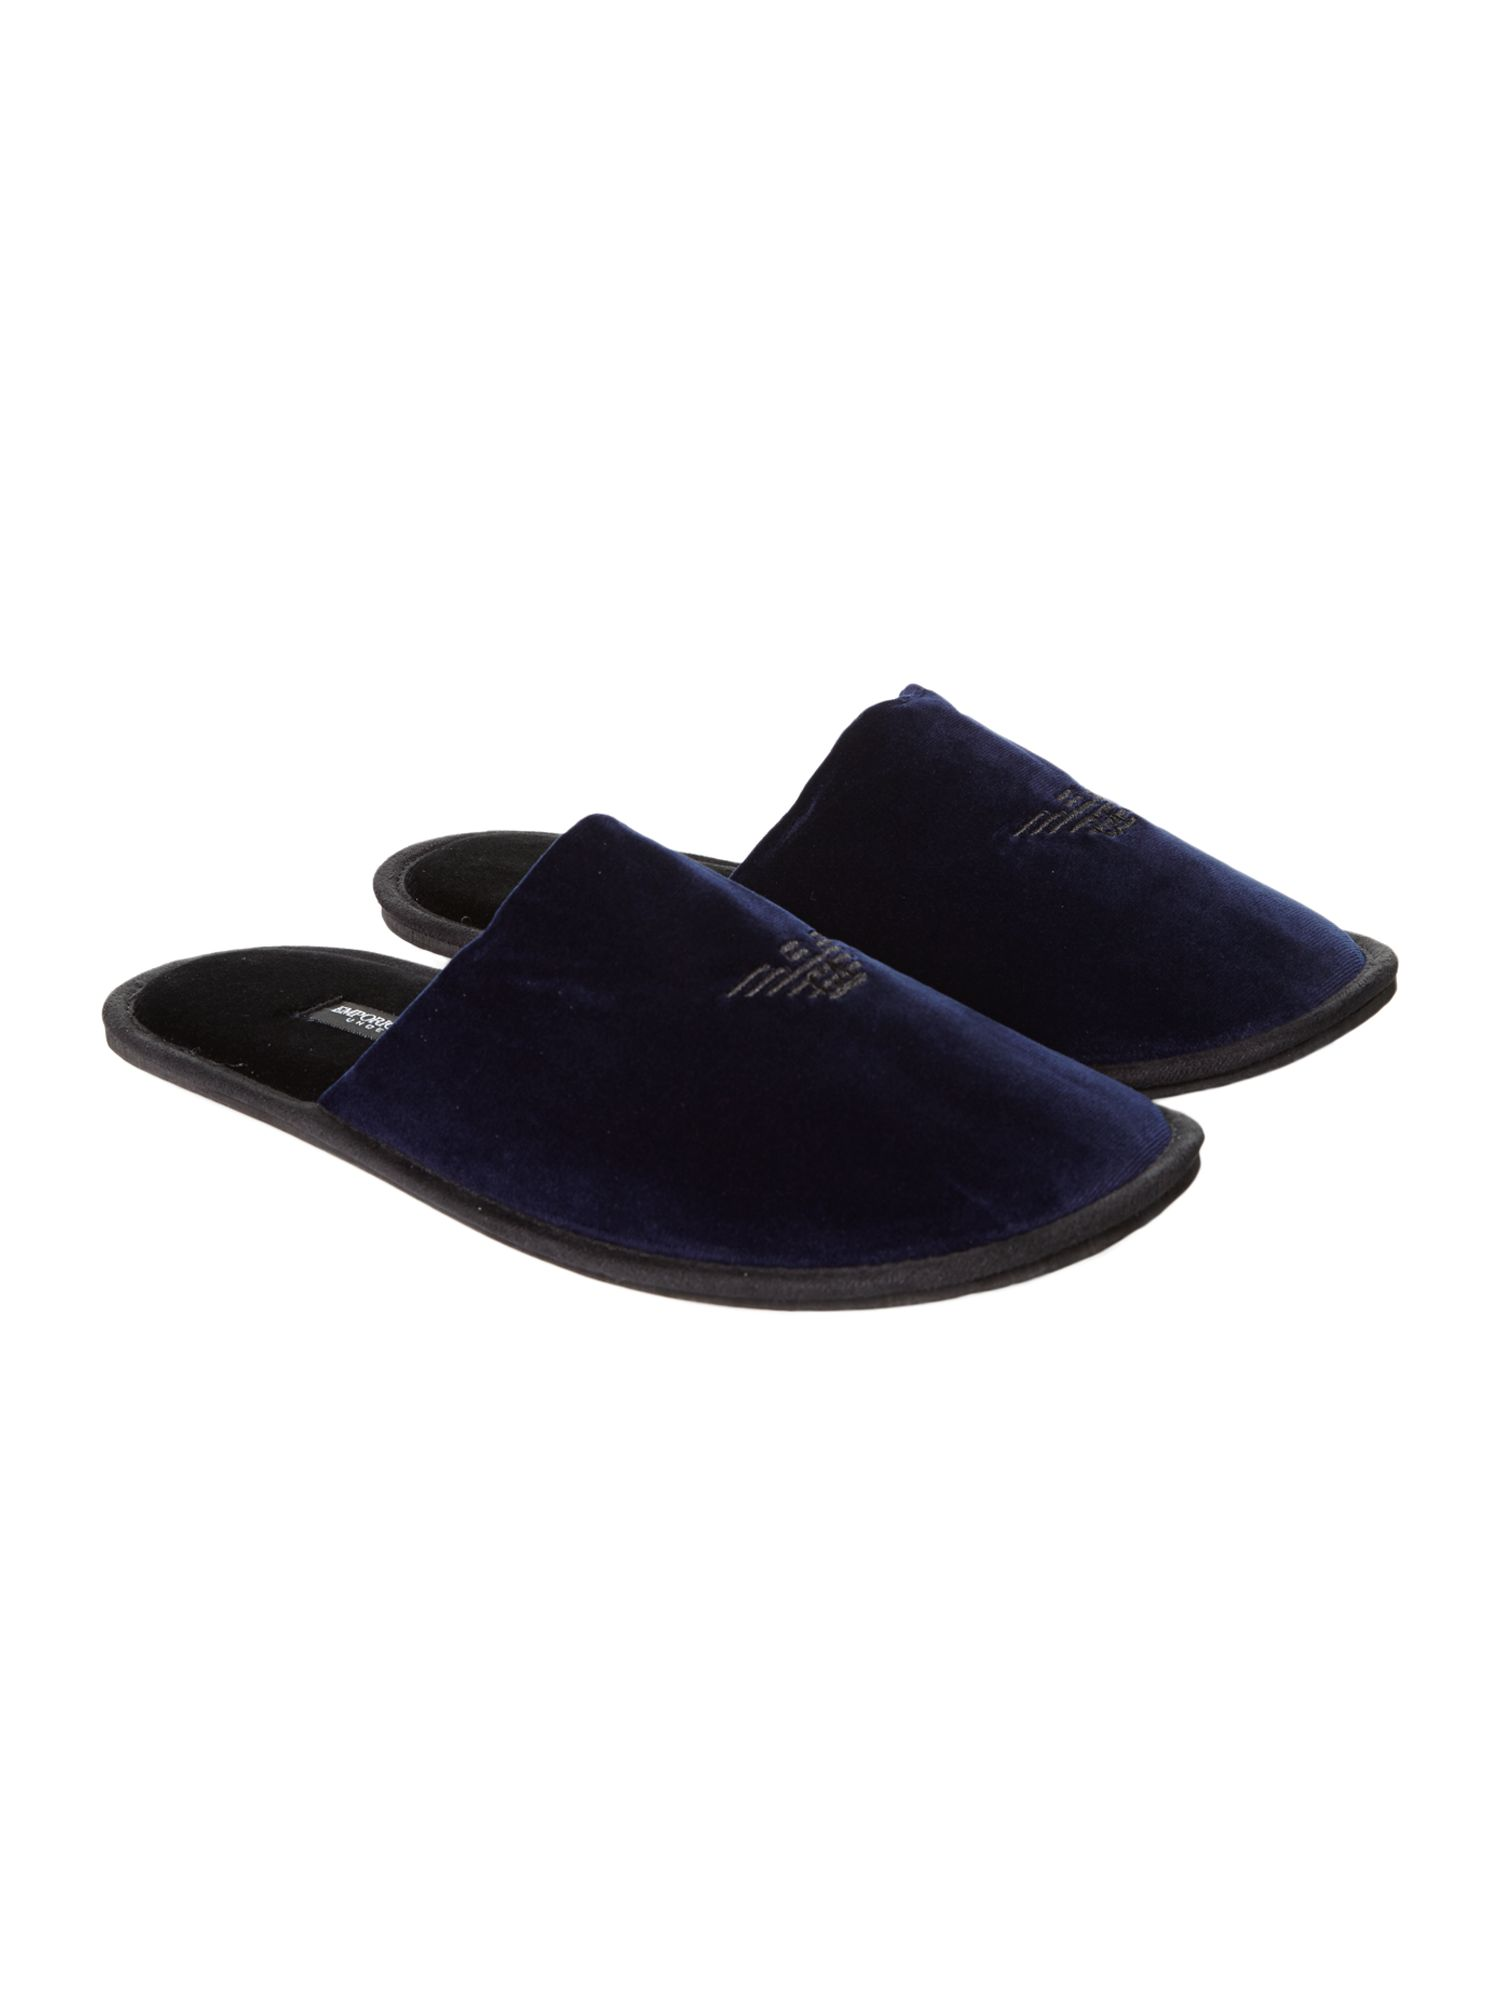 Armani slippers - Osborne chiropractic